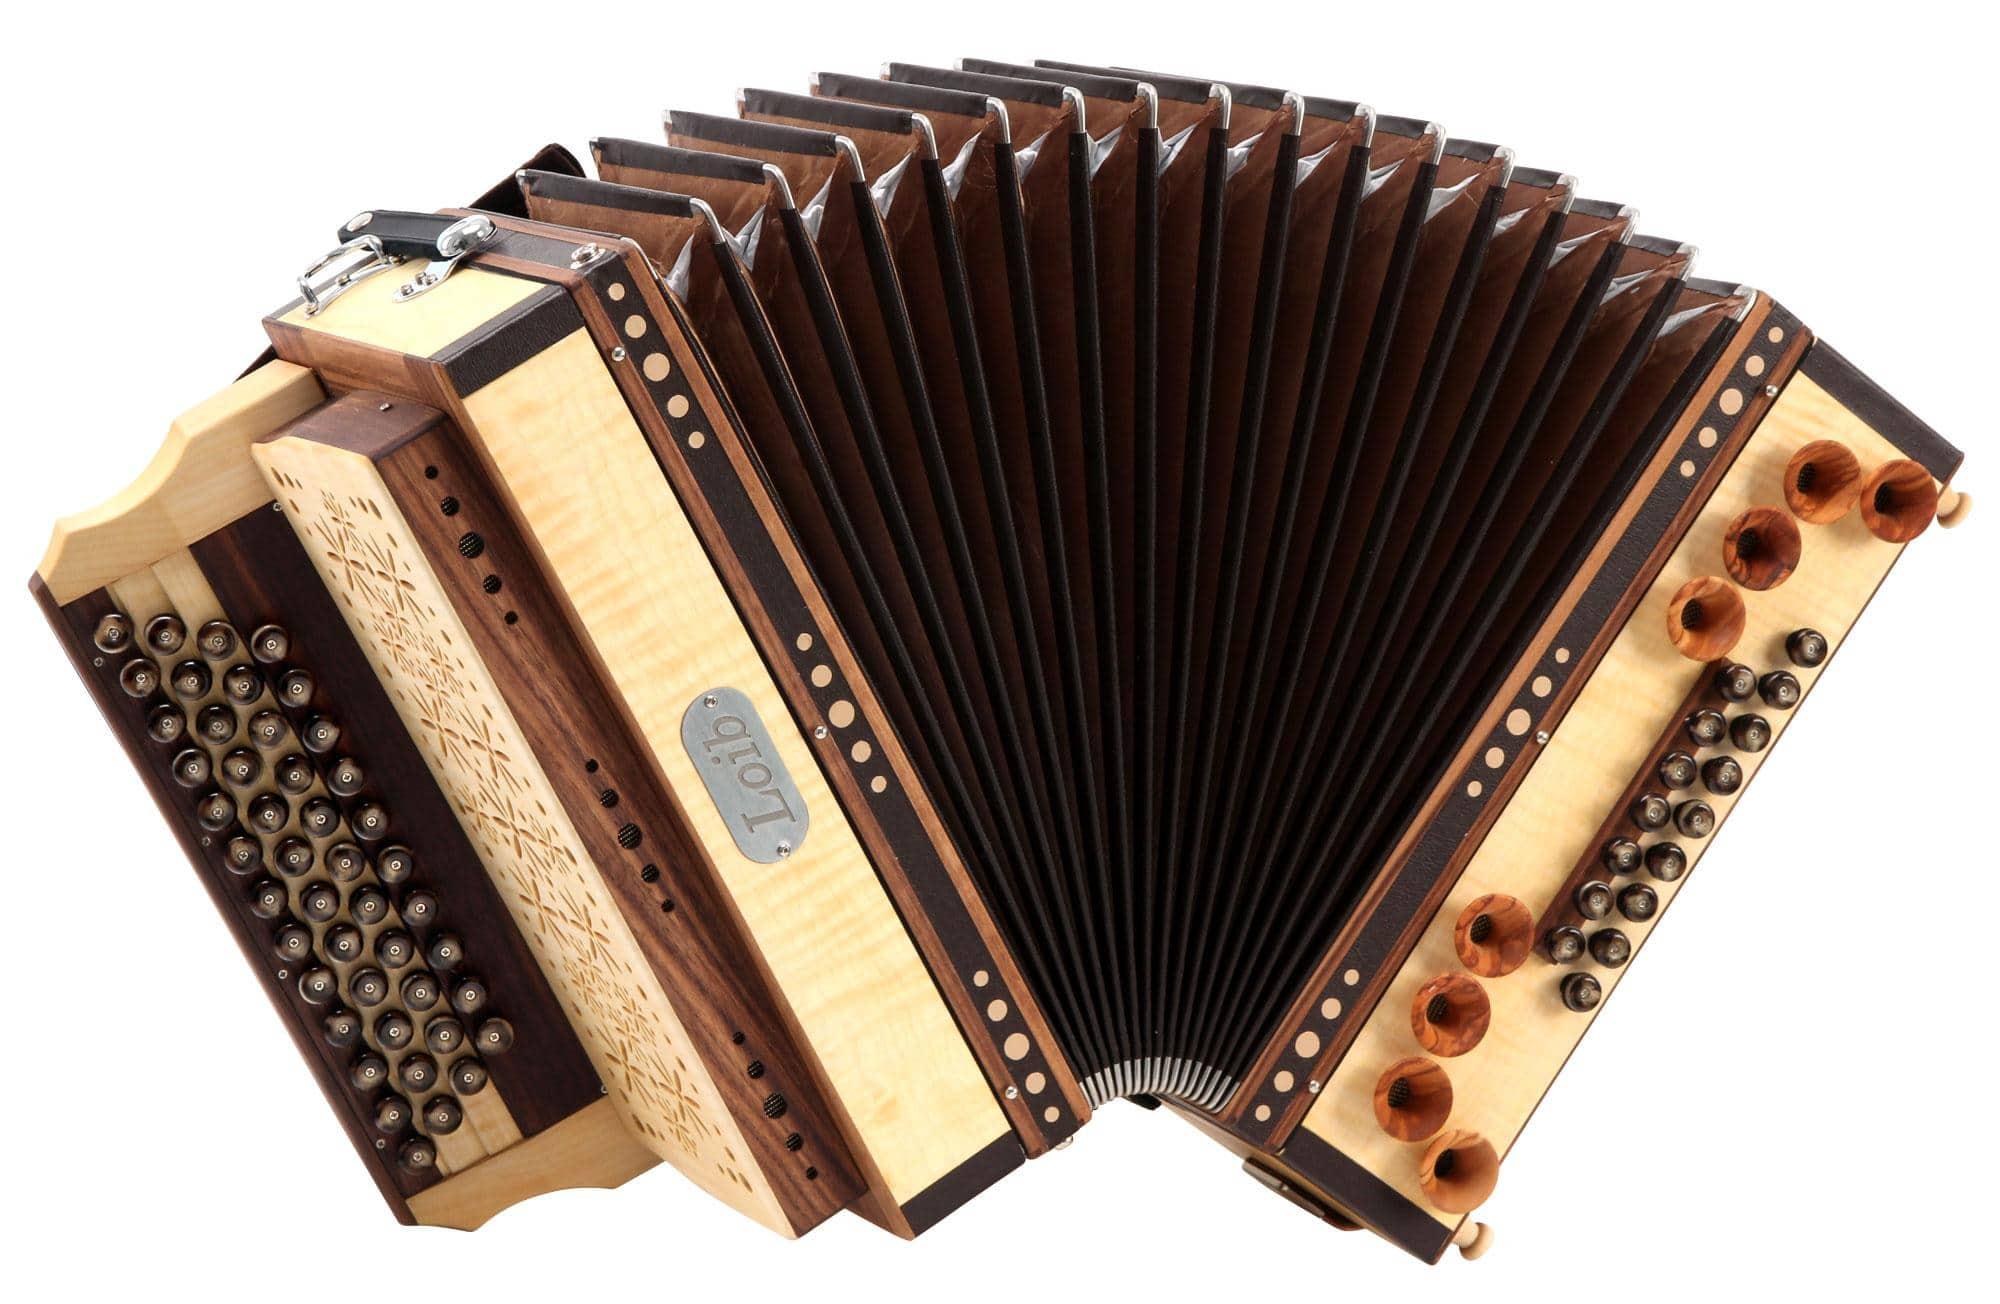 Loib Harmonika IVD Ahorn G-C-F-B H-Bass X-Bass Holzverdeck